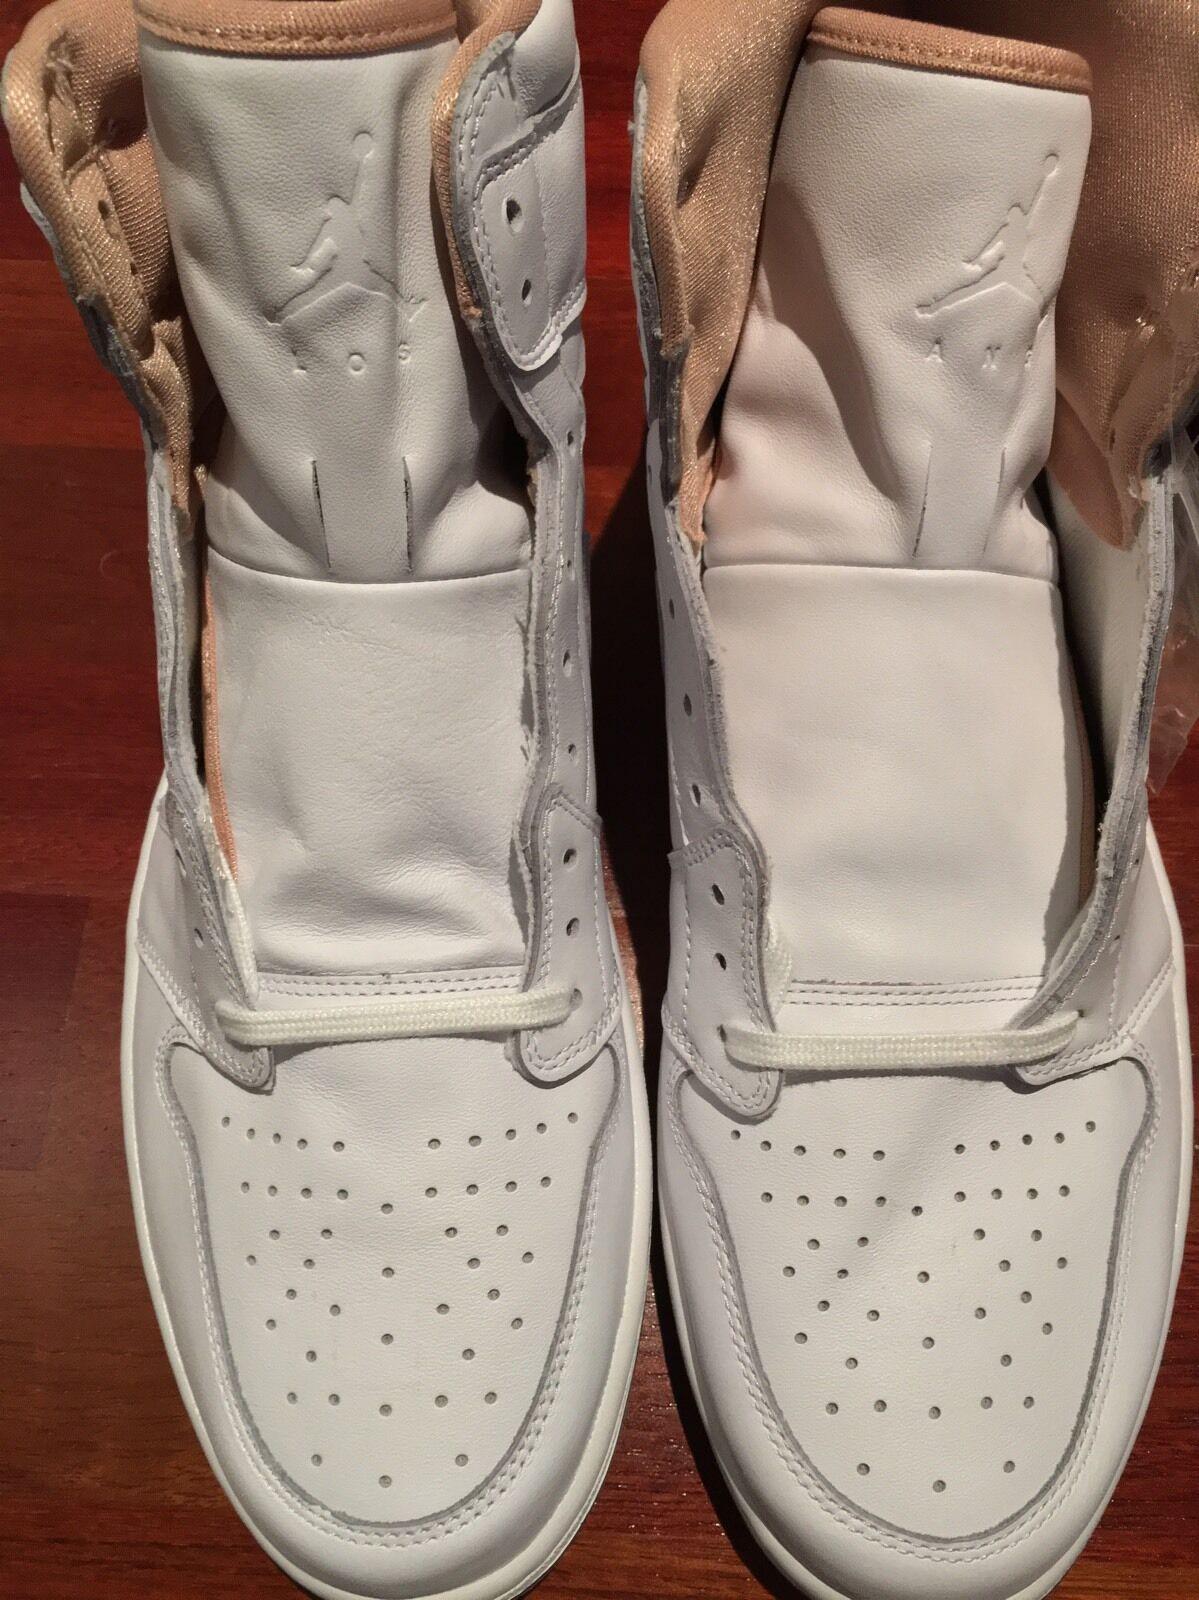 Men Nike Air Jordan 1 Retro High LA Sz 15 White 23 Los Angeles New 819012-130